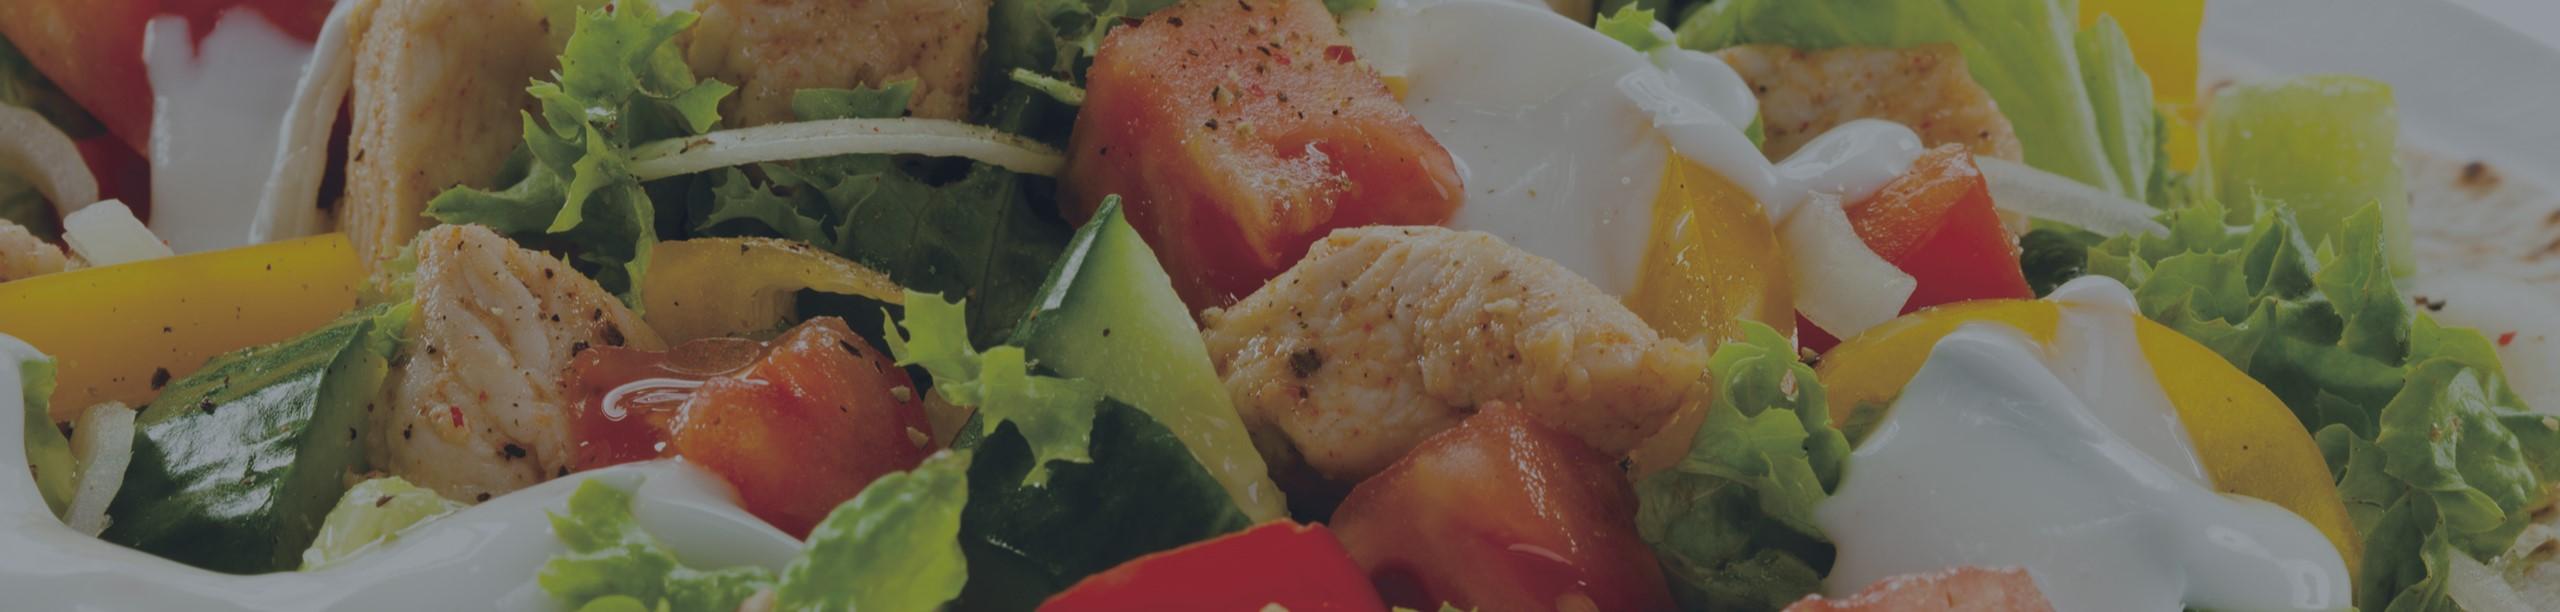 Salad1-1